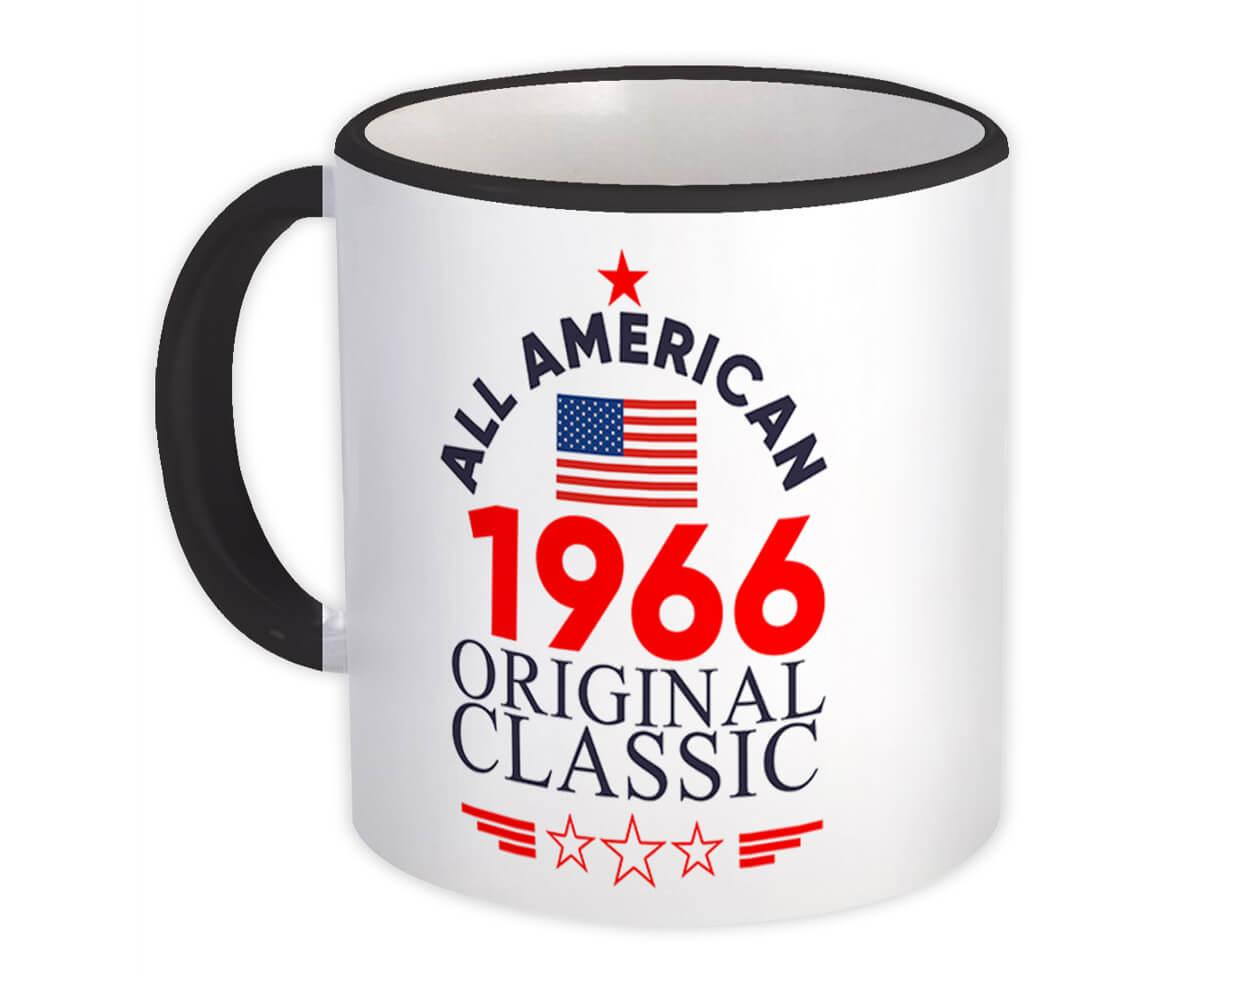 1966 Birthday : Gift Mug All American Original Classic Flag Patriotic Age USA